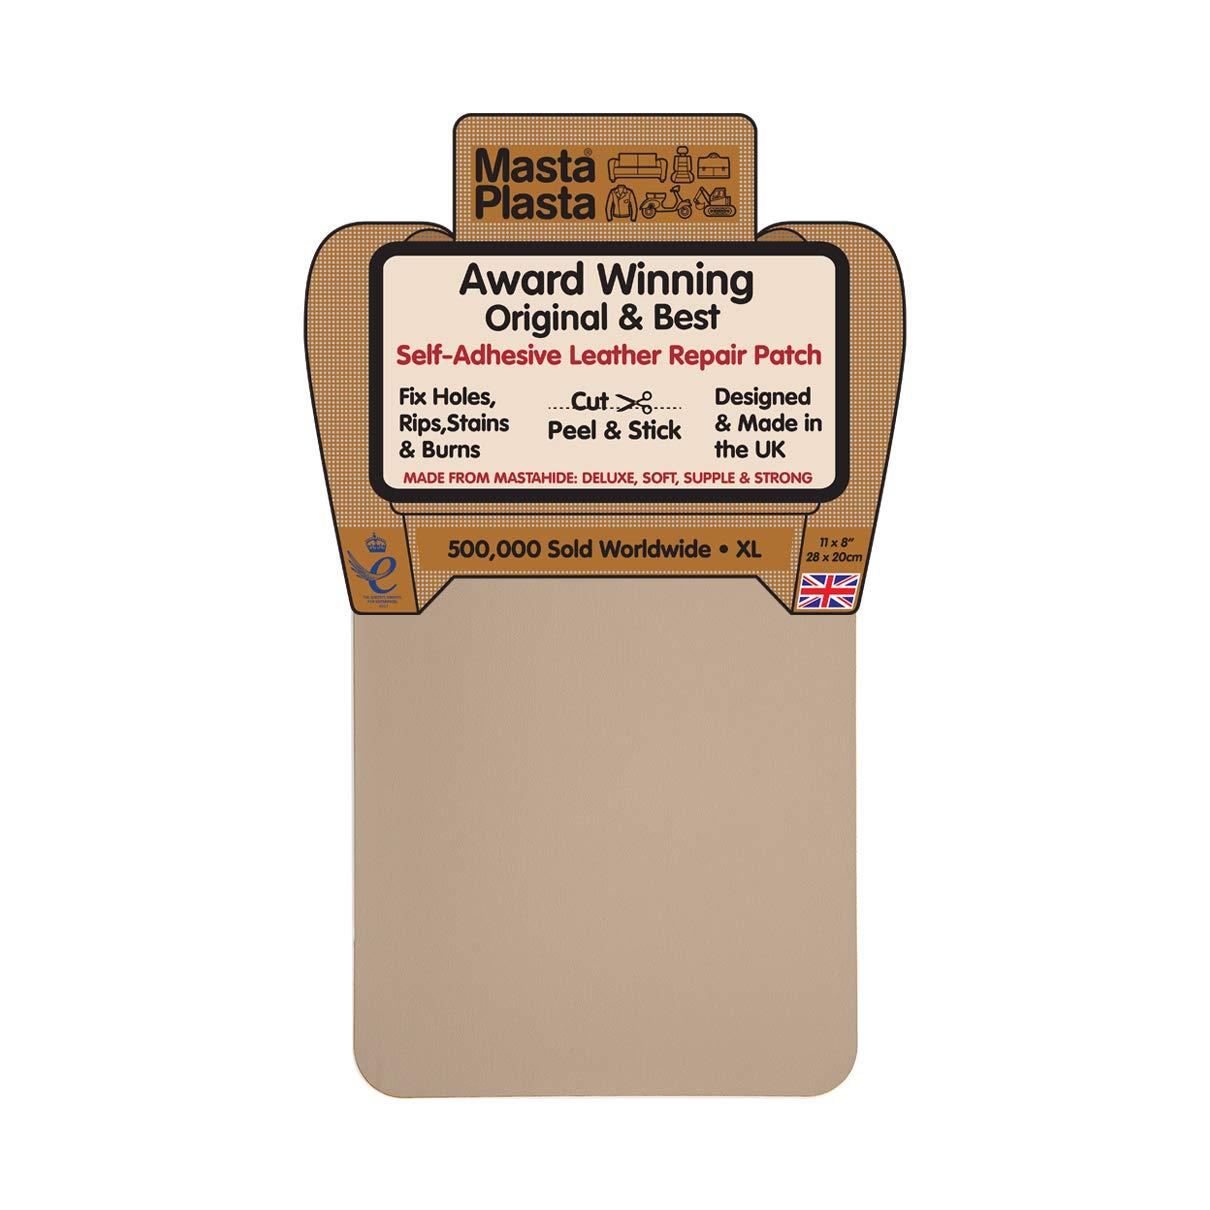 MastaPlasta Self-Adhesive Patch for Leather and Vinyl Repair, XL Plain, Beige -